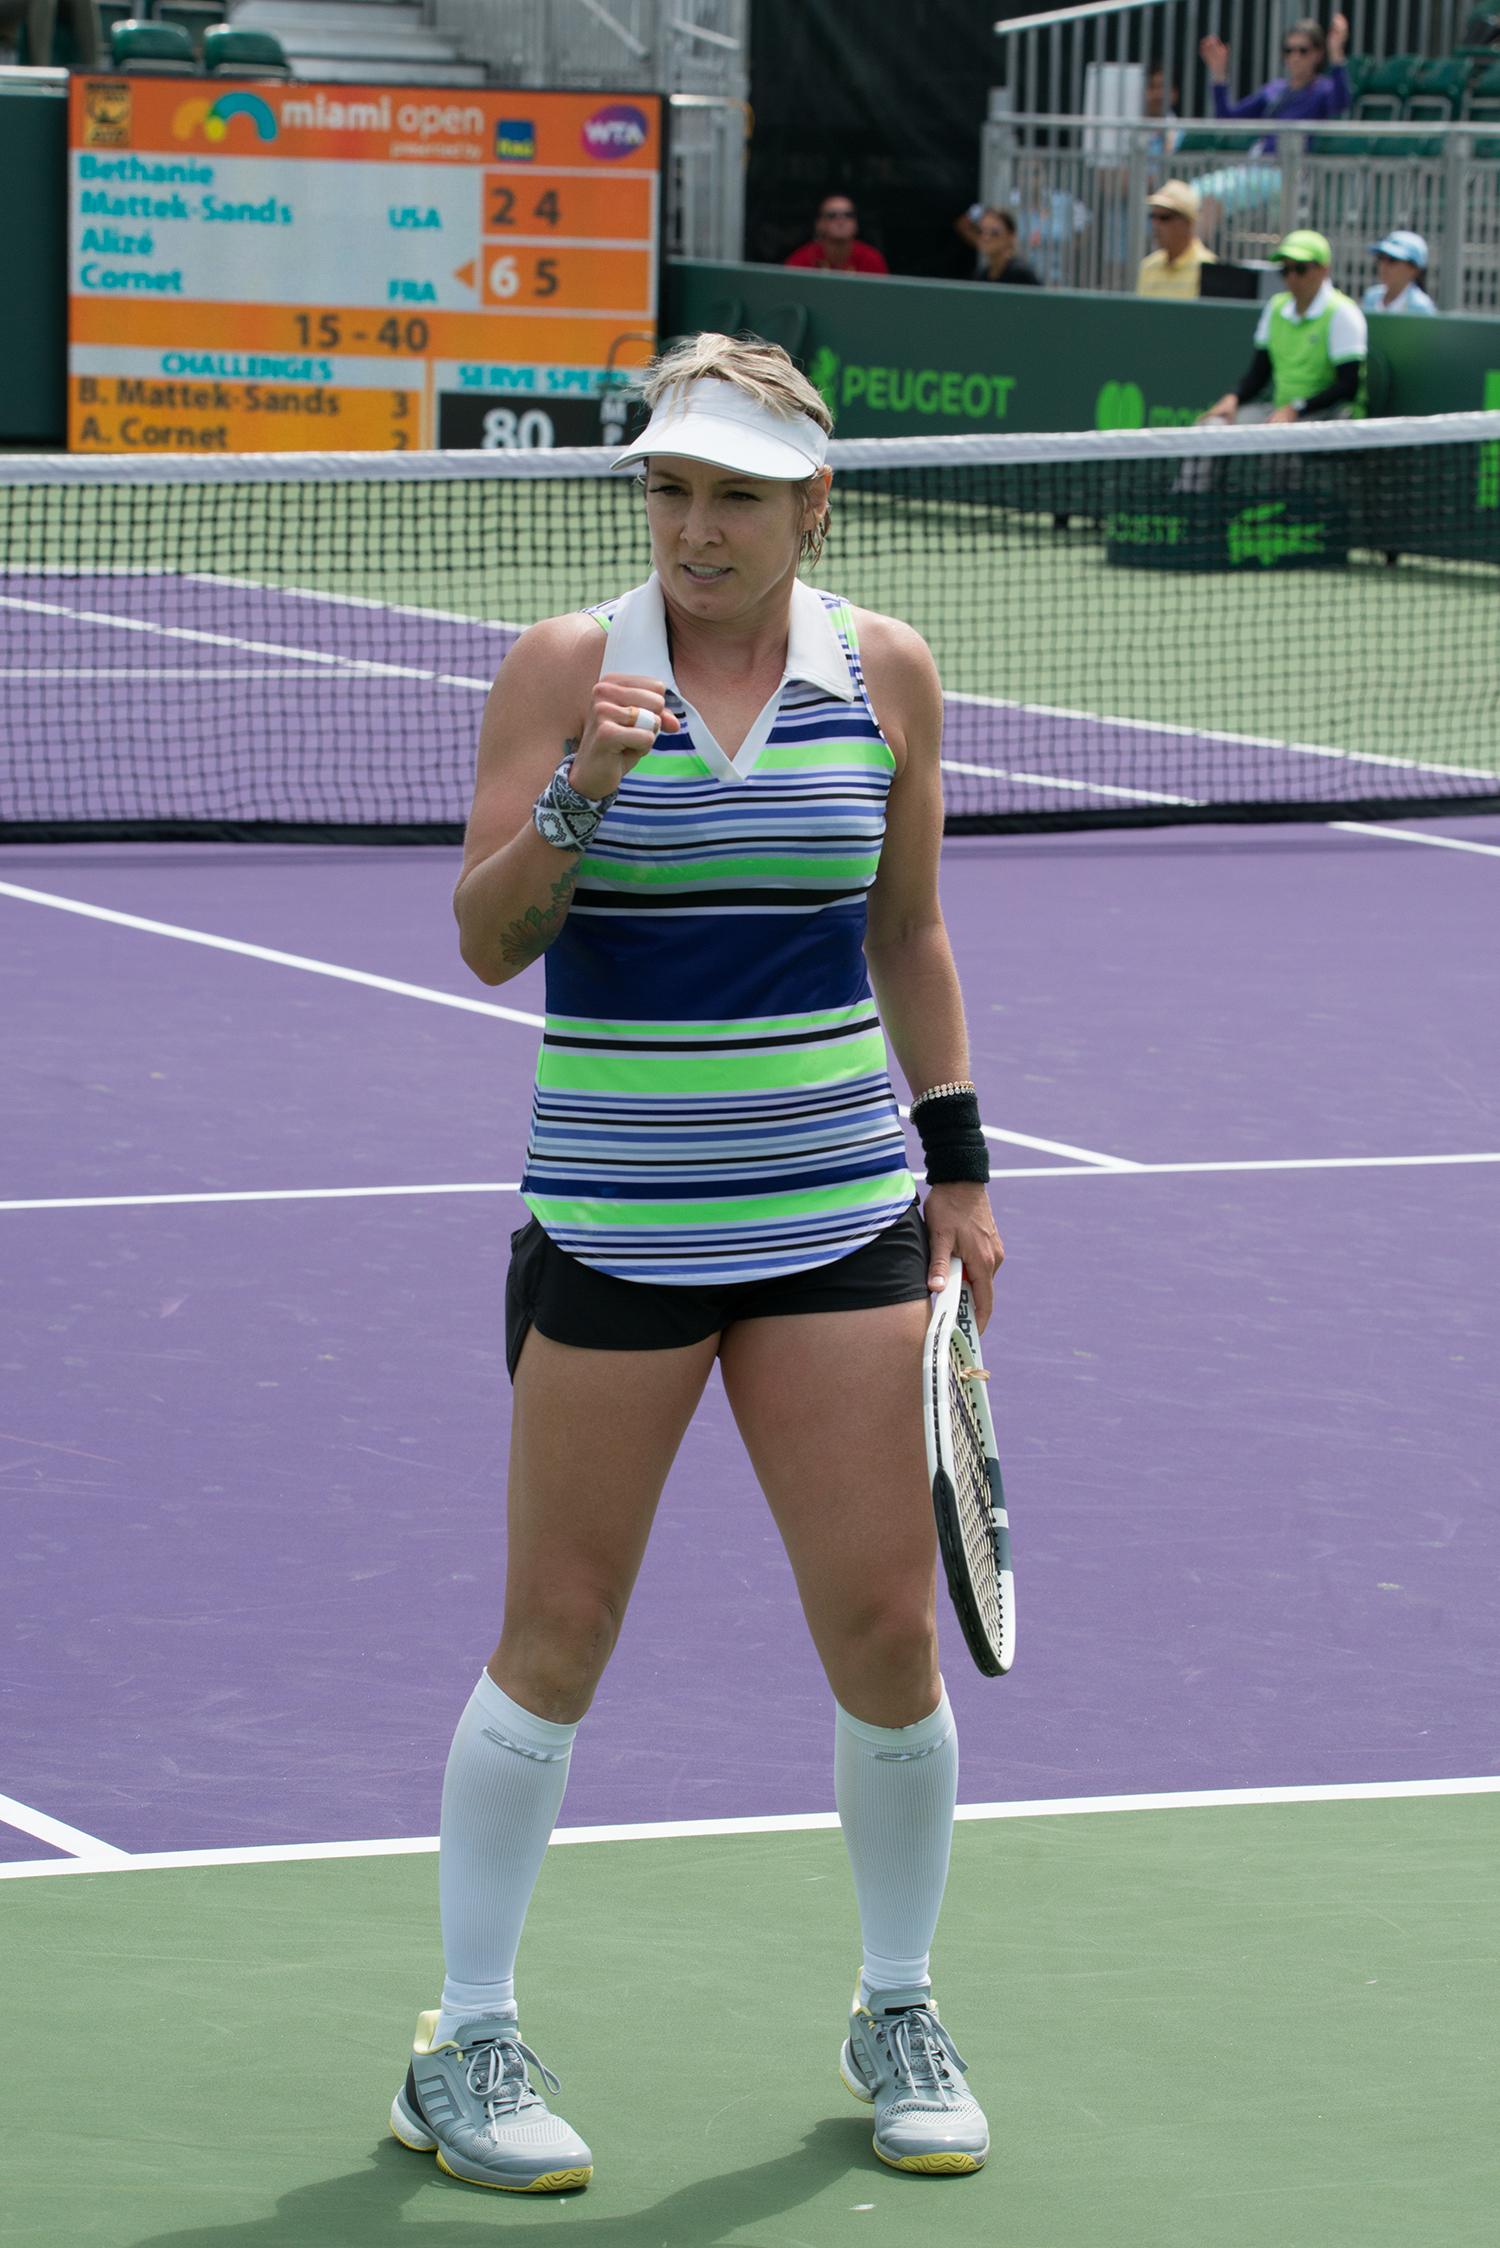 #matteksands,#behtanie, #american, #tennis, #miamiopen, #miami, #womenstennis, #goldmedalist, #comeback, #fivealll